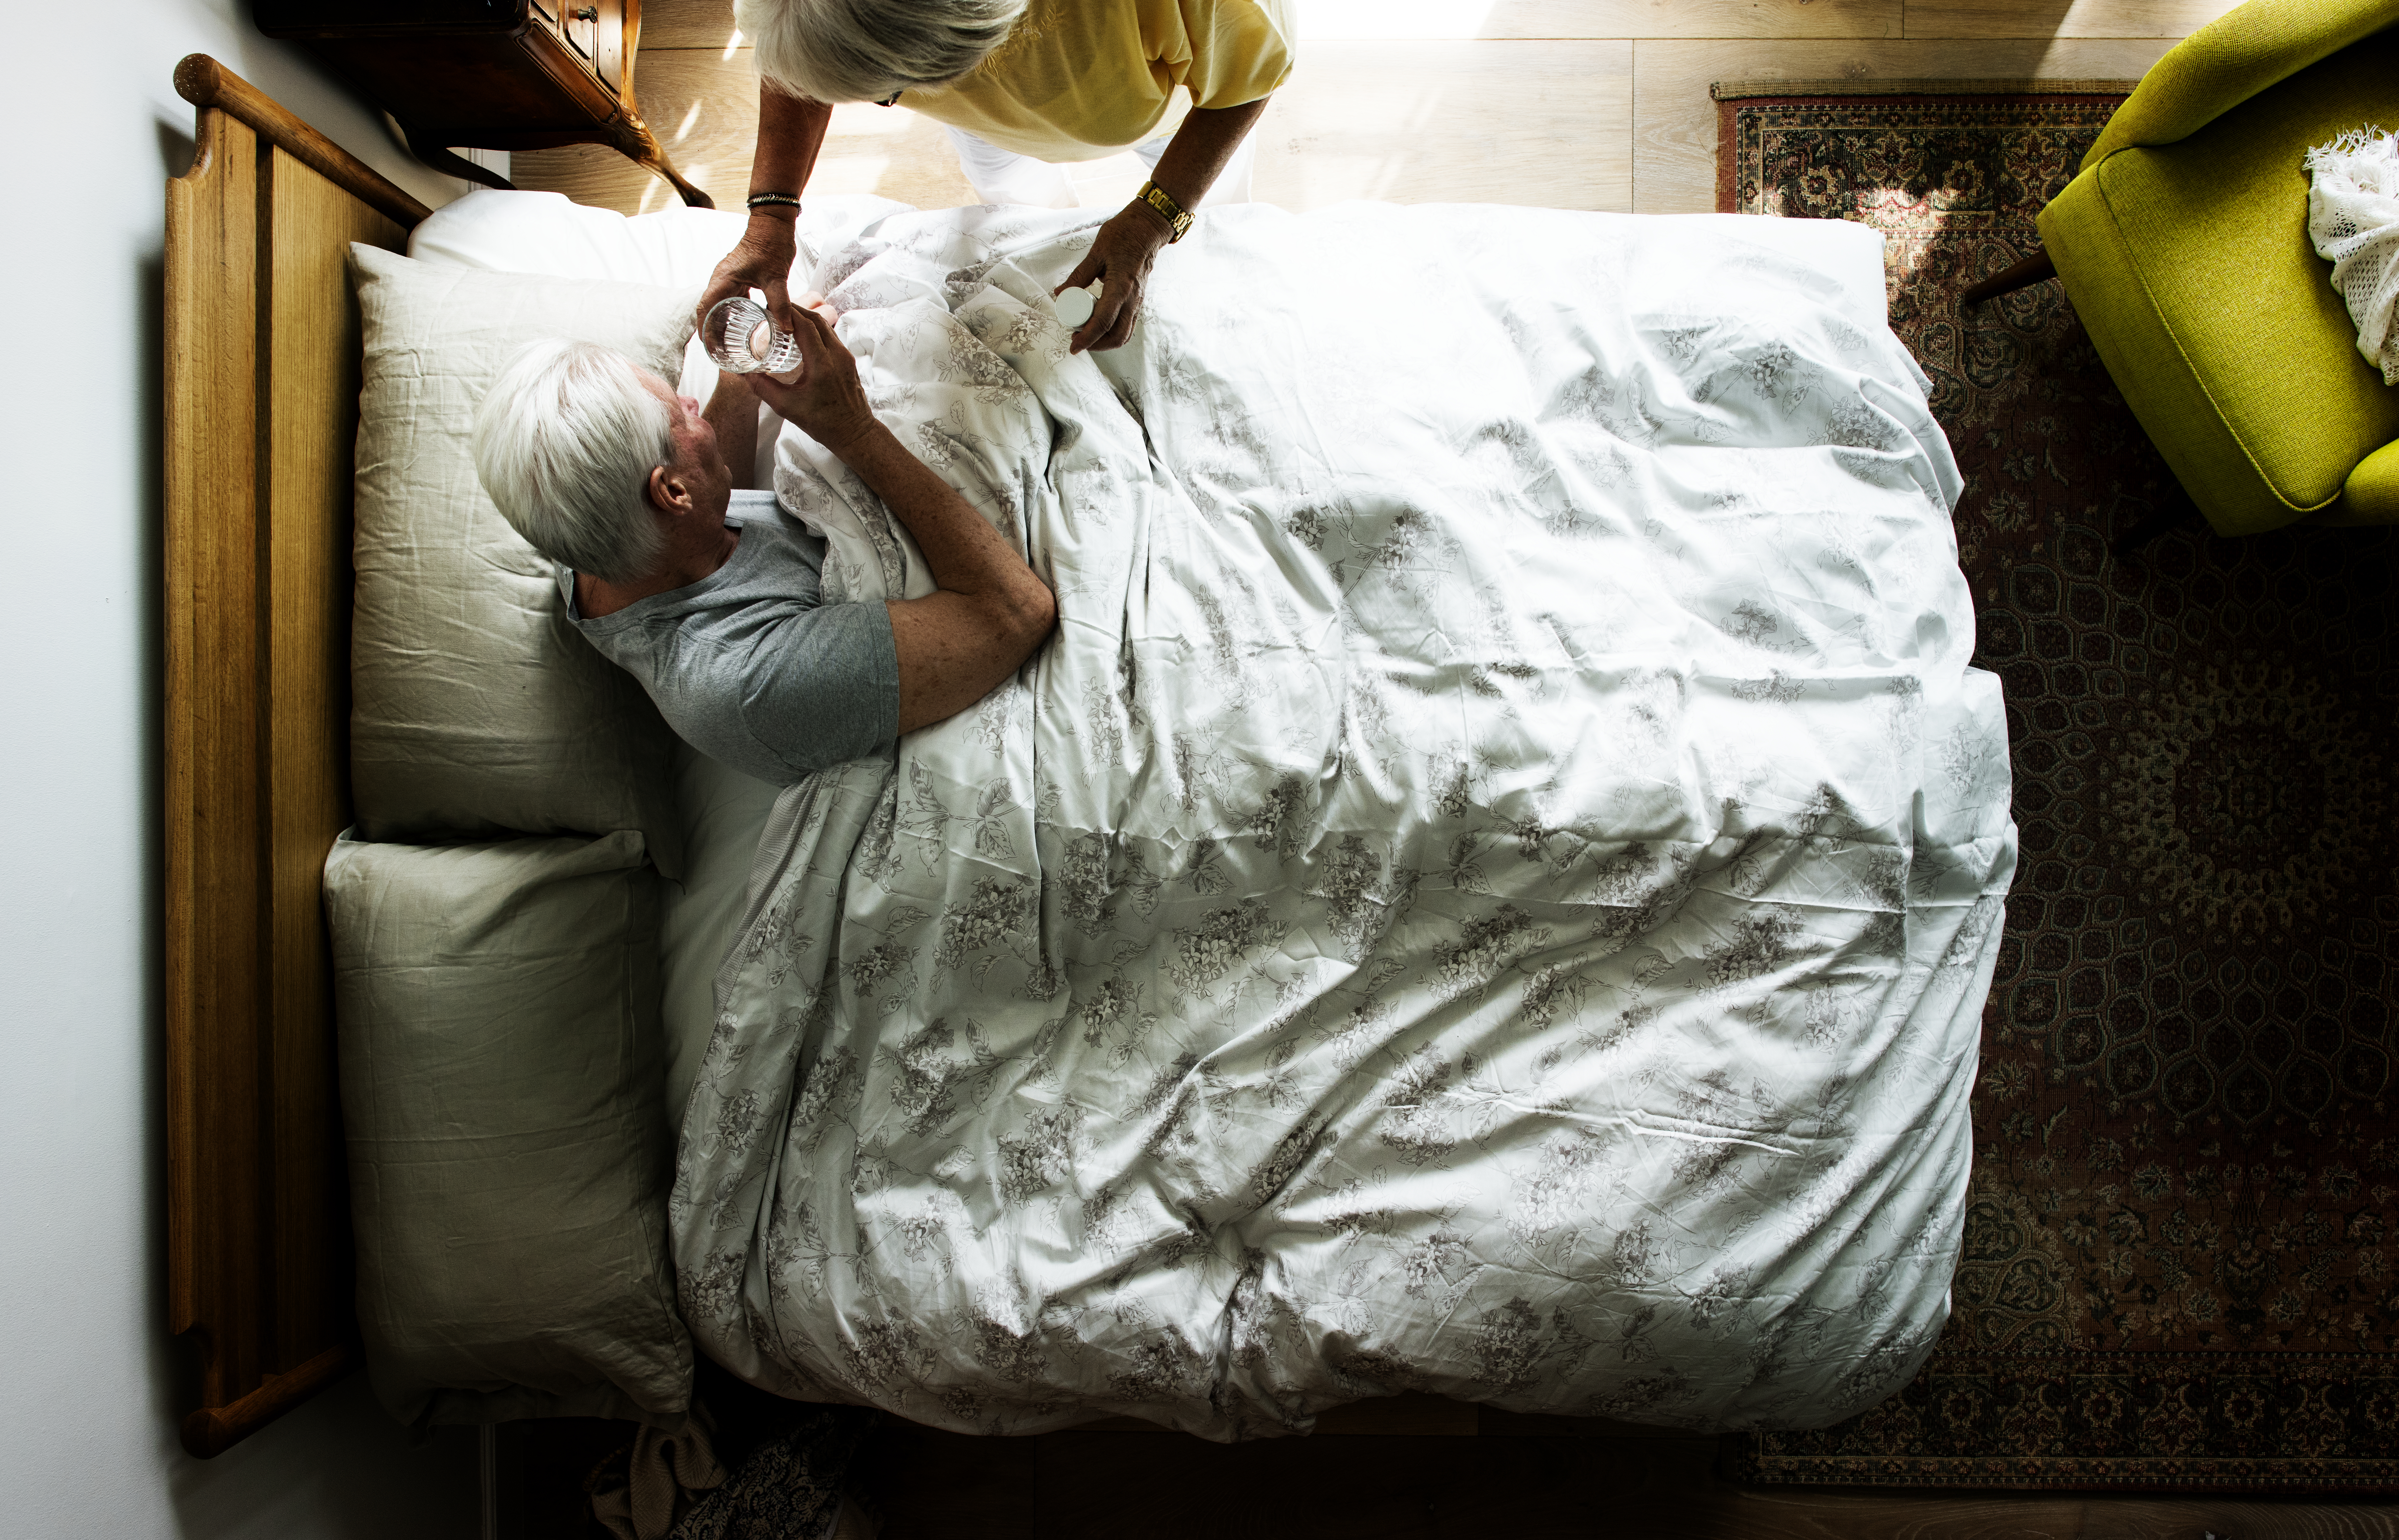 Decisions-elderly-parents.jpg